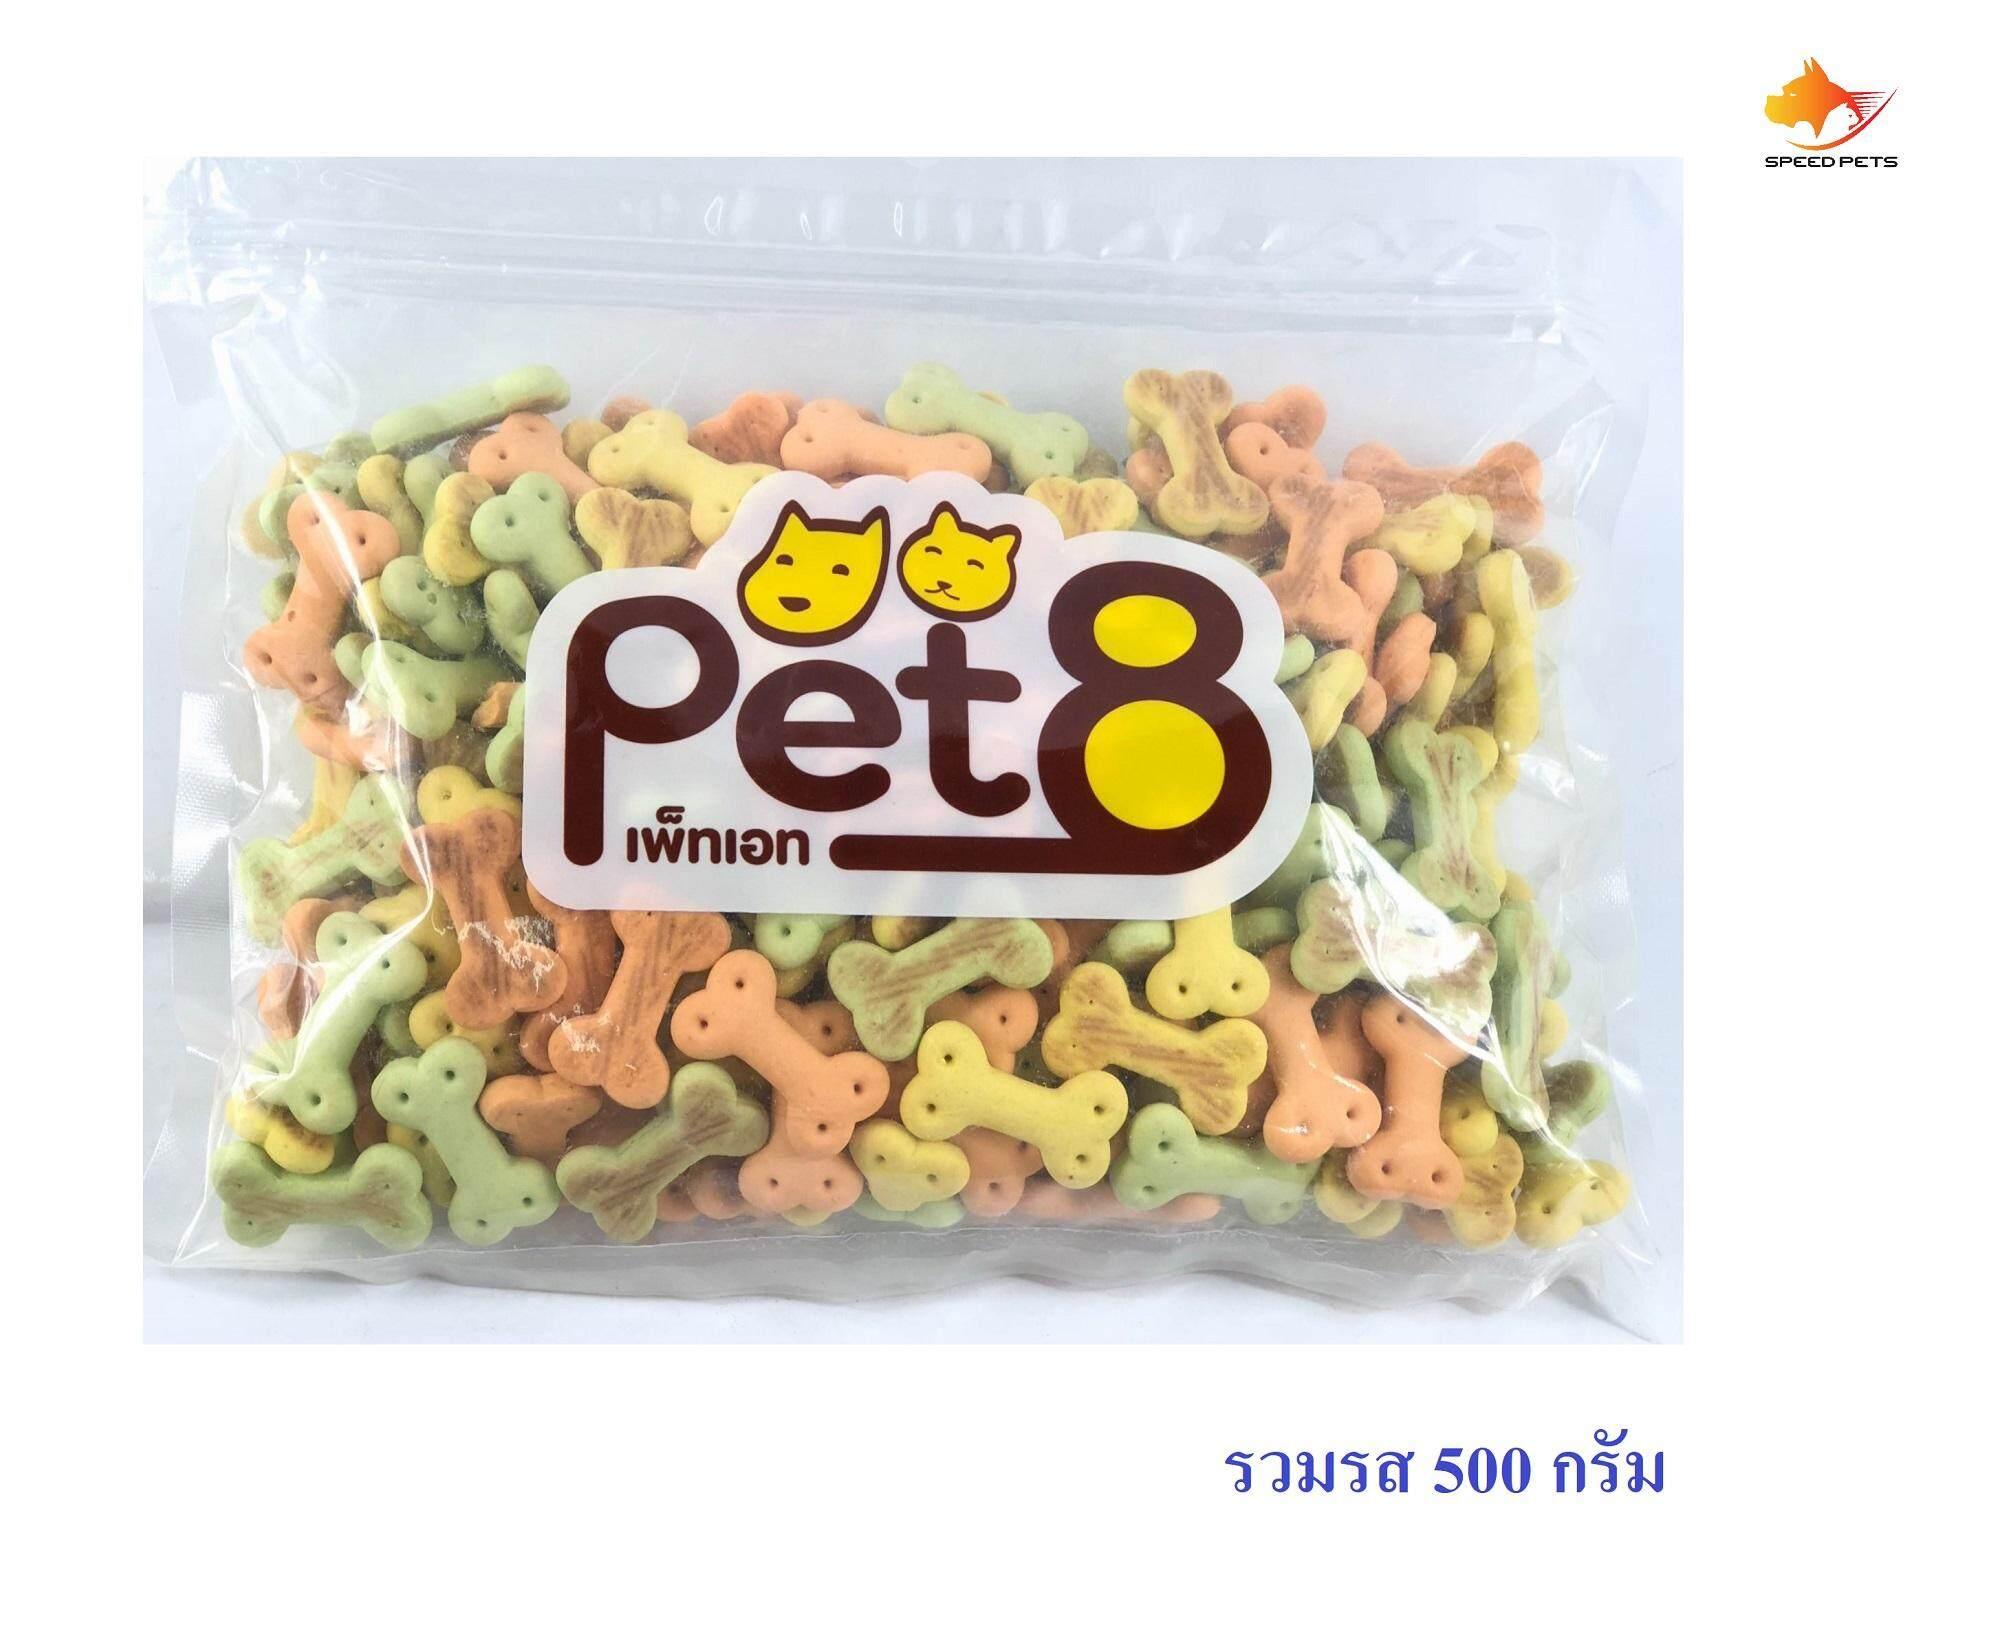 Pet8 Dog Biscuit ขนมสุนัข บิสกิต รวมรส 500 กรัม By Speedpets.